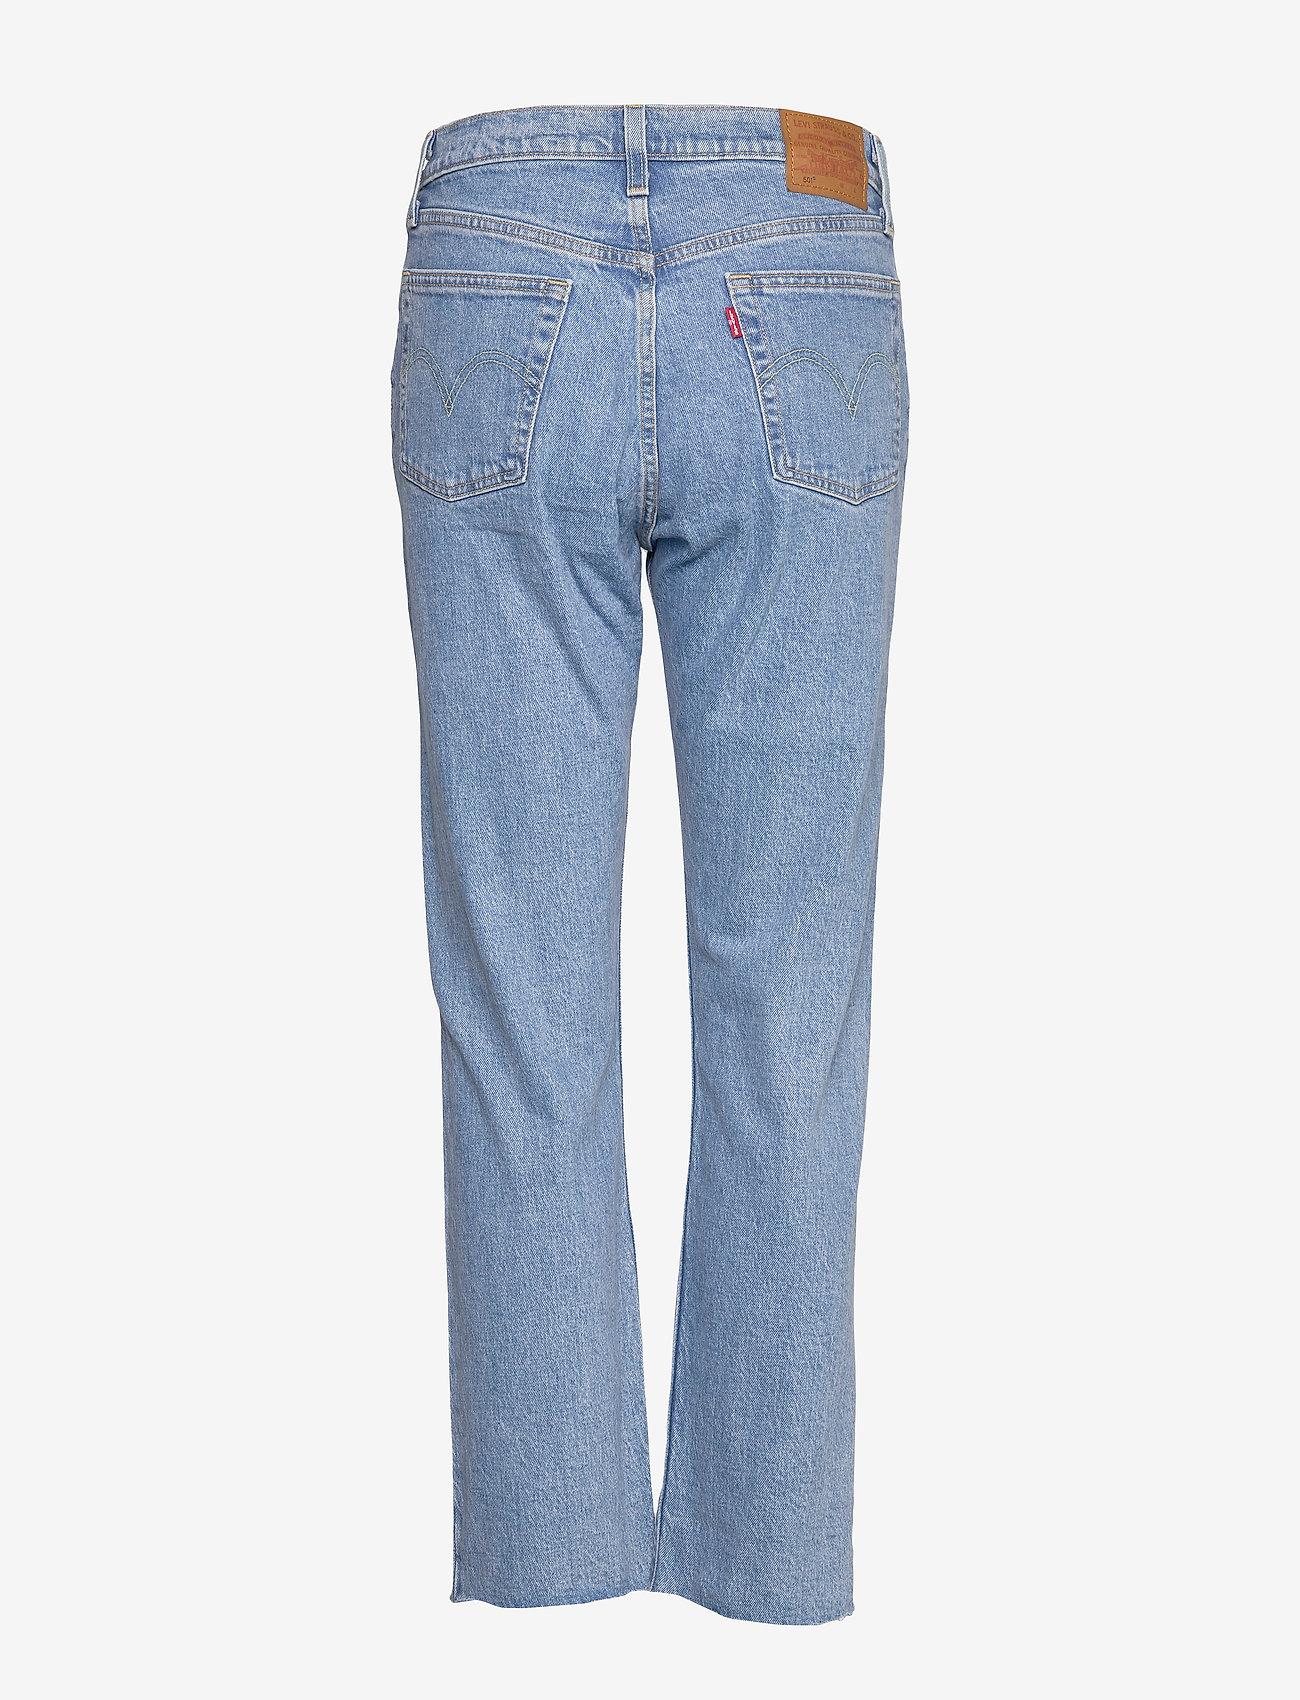 LEVI´S Women - 501 CROP TANGO BEATS - straight jeans - light indigo - worn in - 1